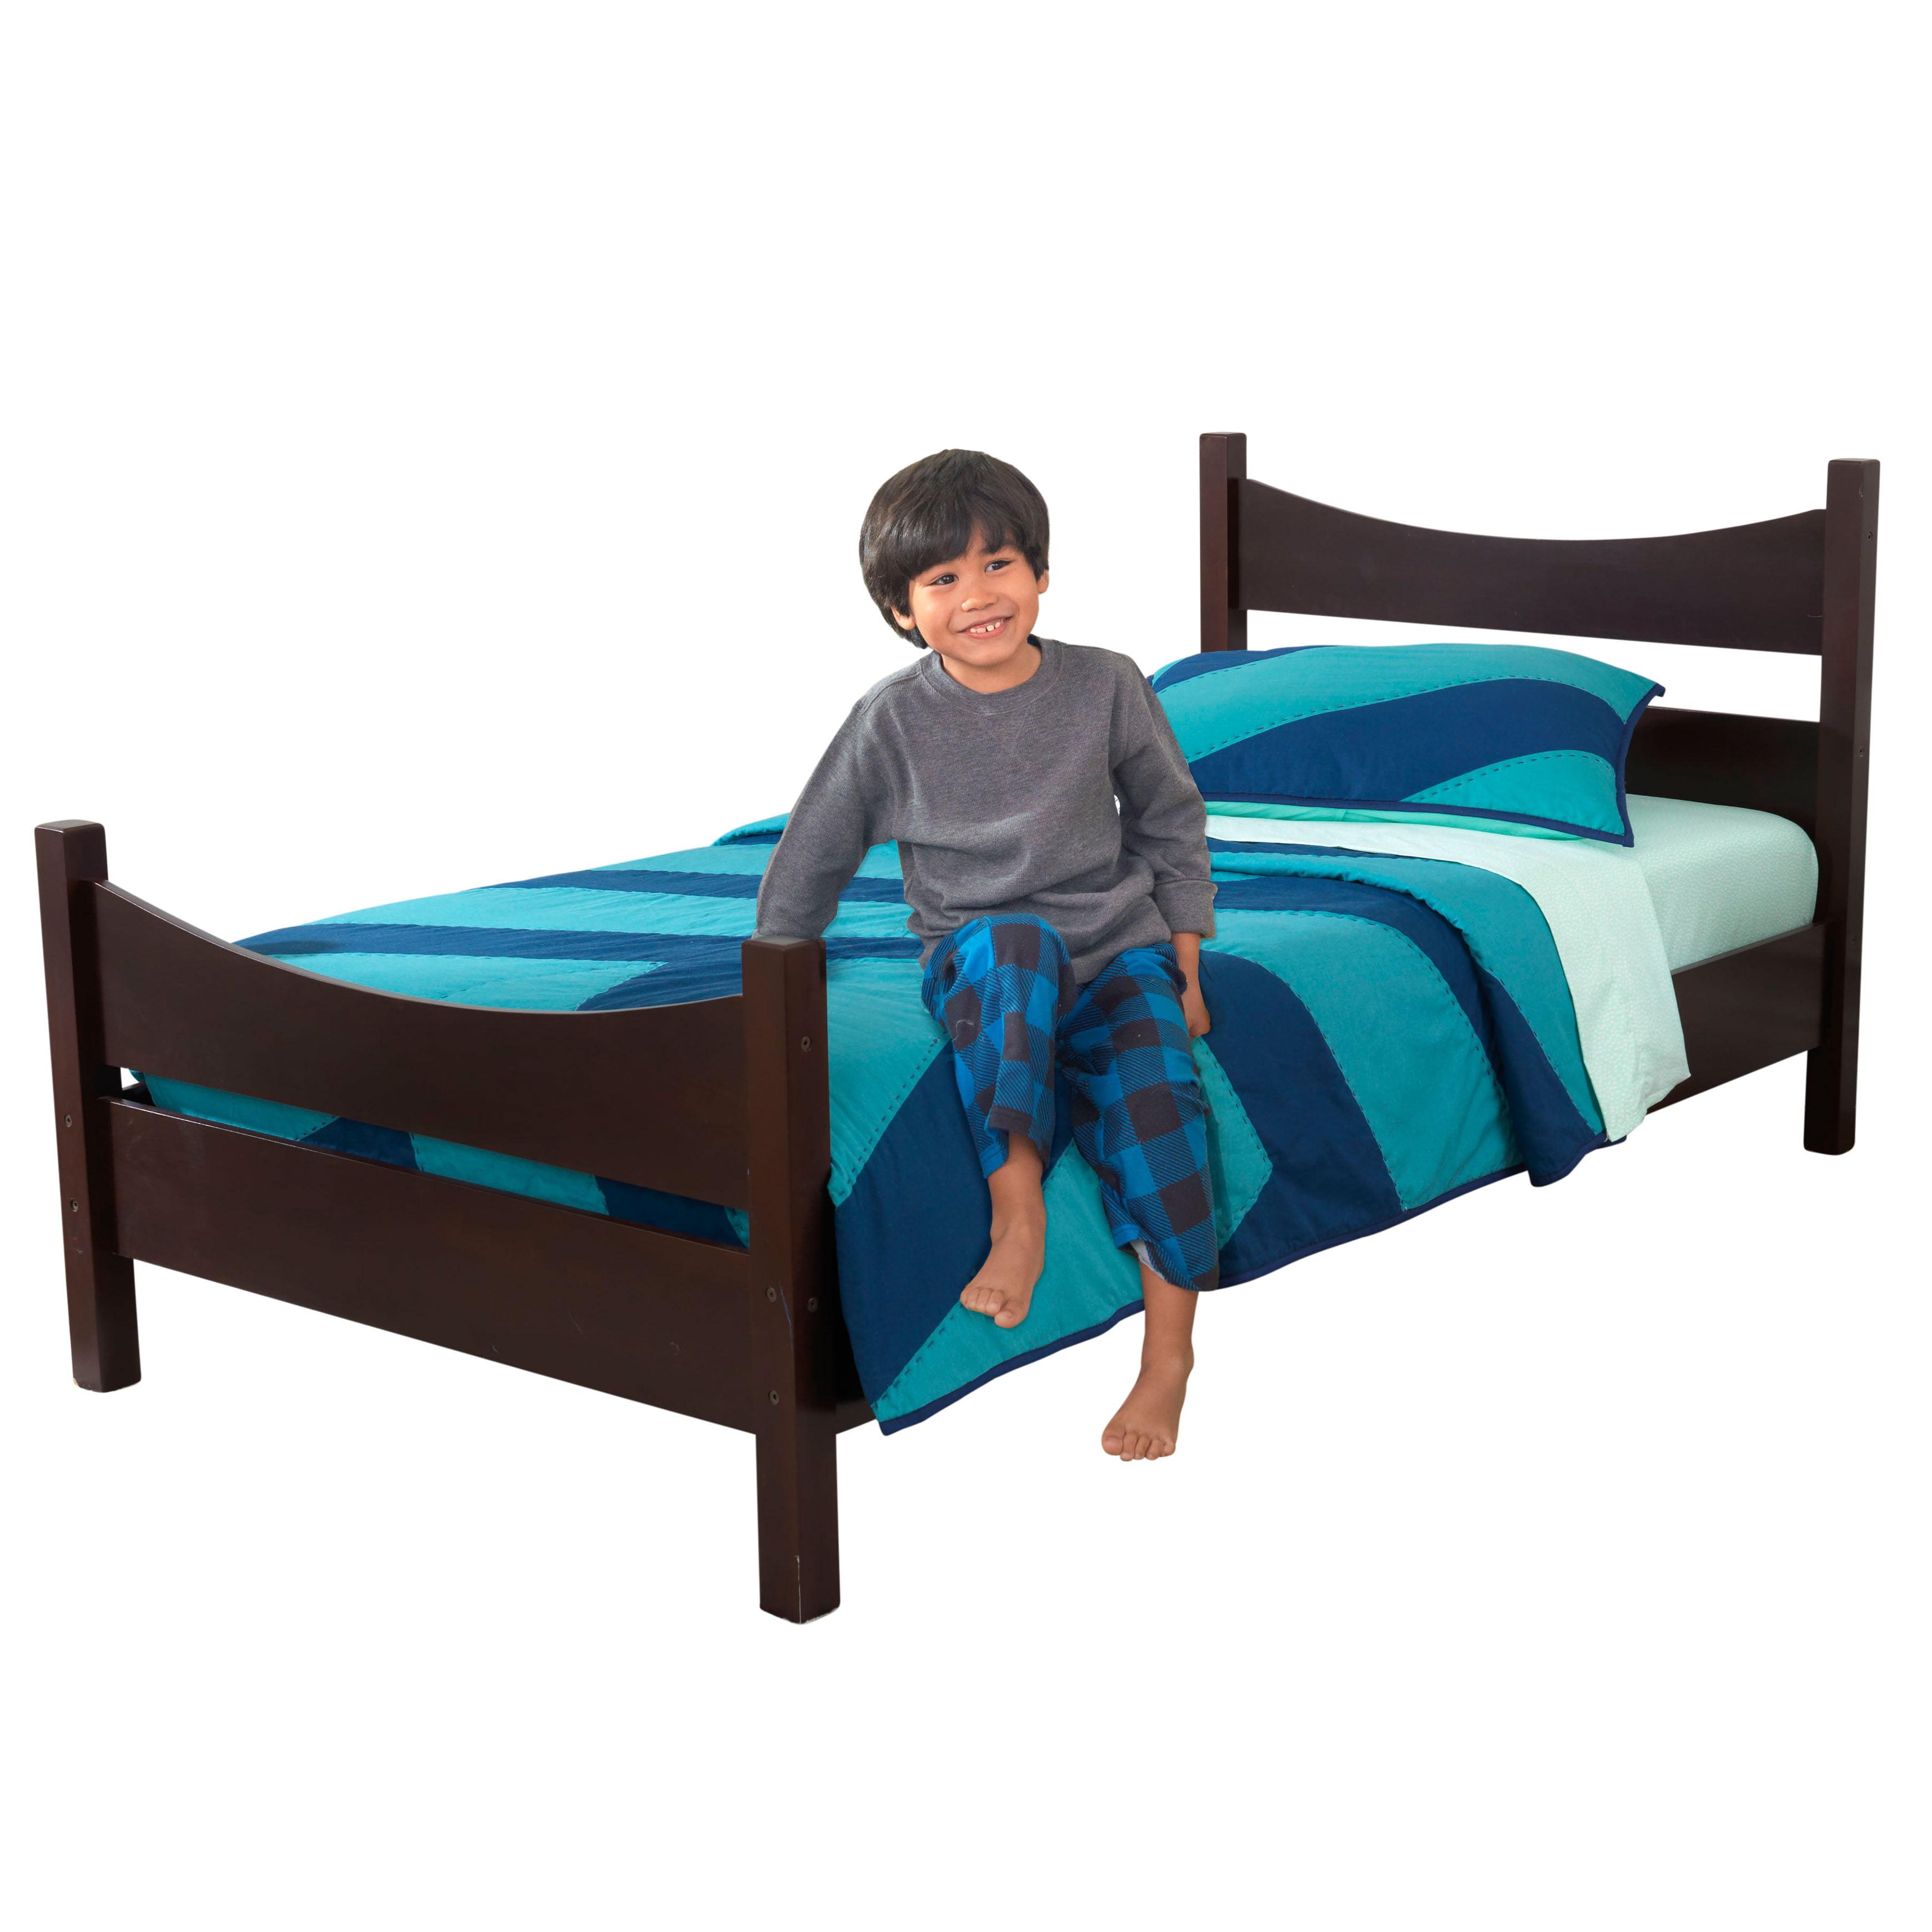 Kidkraft Addison Wooden Kids Twin Bed Multiple Colors Walmart